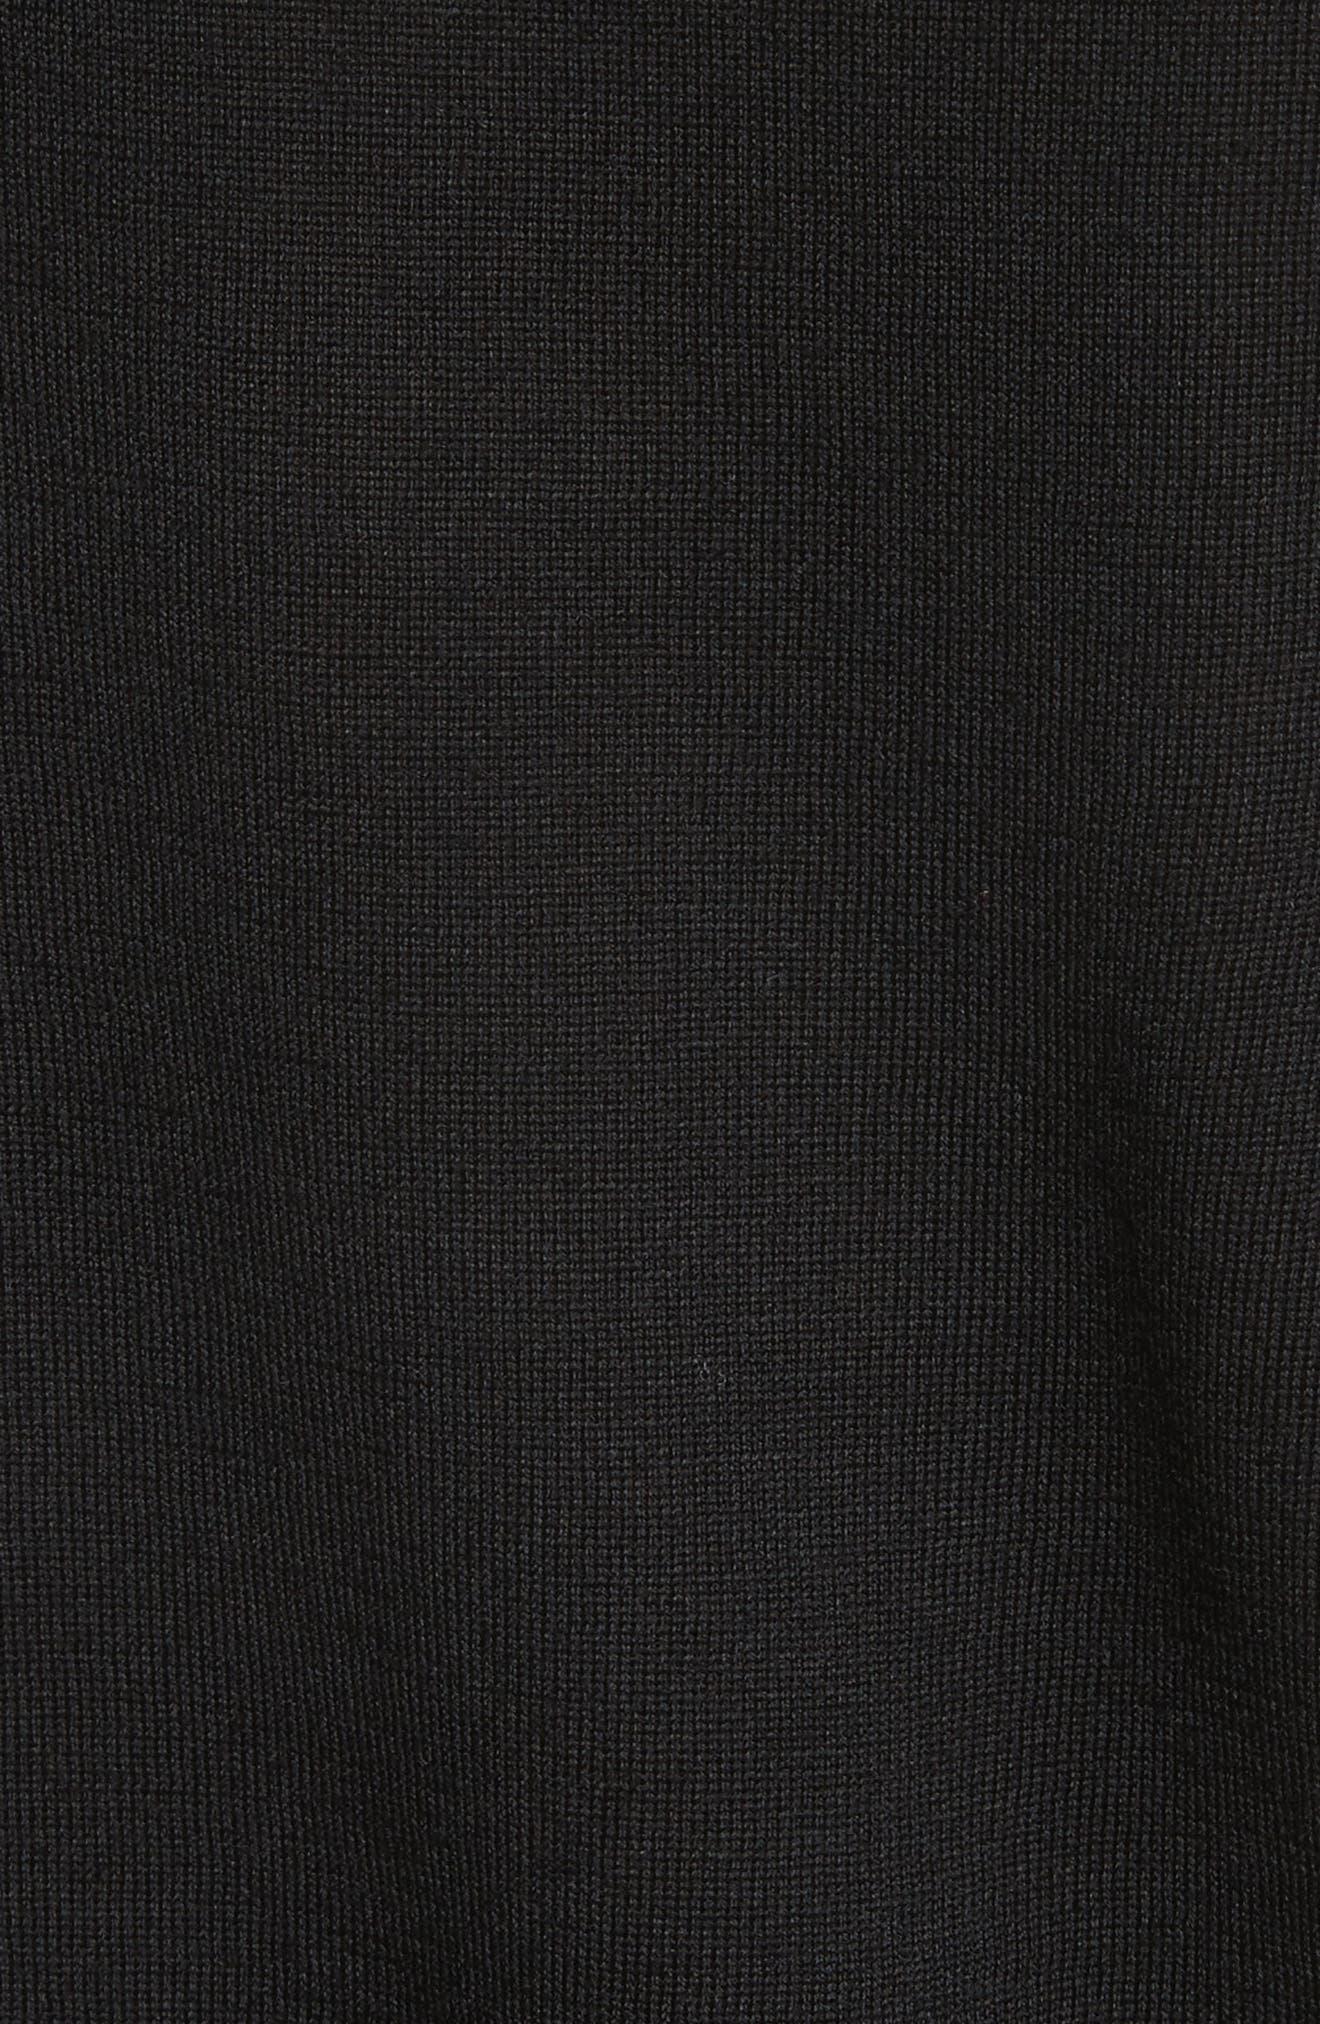 BURBERRY,                             Viar Merino Wool Sweater,                             Alternate thumbnail 5, color,                             001